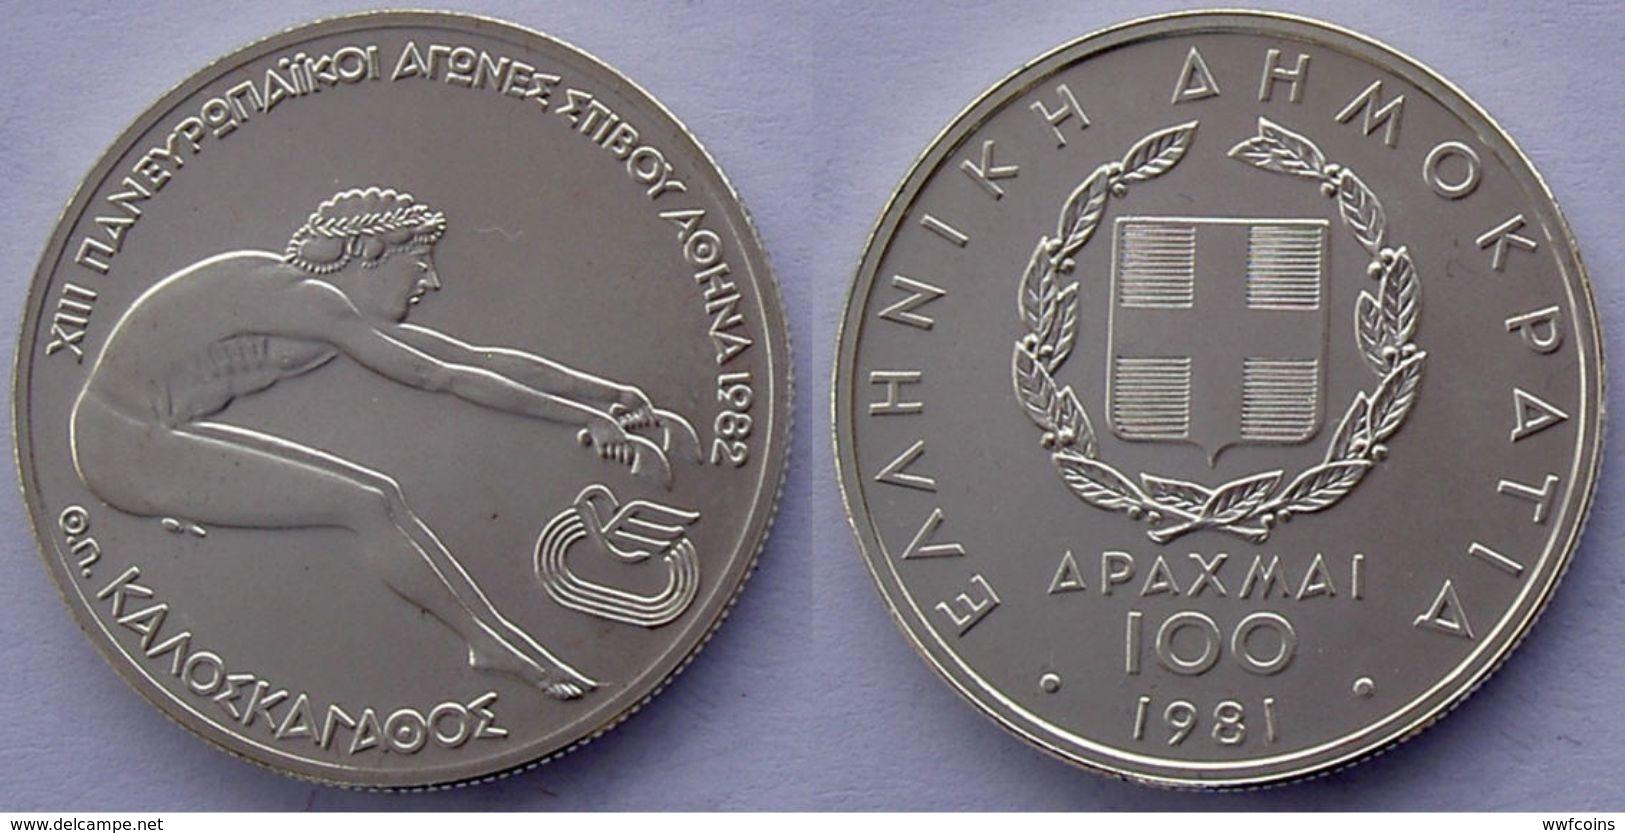 GREECE 100 A 1981 ARGENTO SILVER PANEUROPEAN GAMES ANCIENT OLYMPIC JUMPING PESO 5,78g TITOLO 0,900 CONSERVAZIONE FDC UNC - Grecia